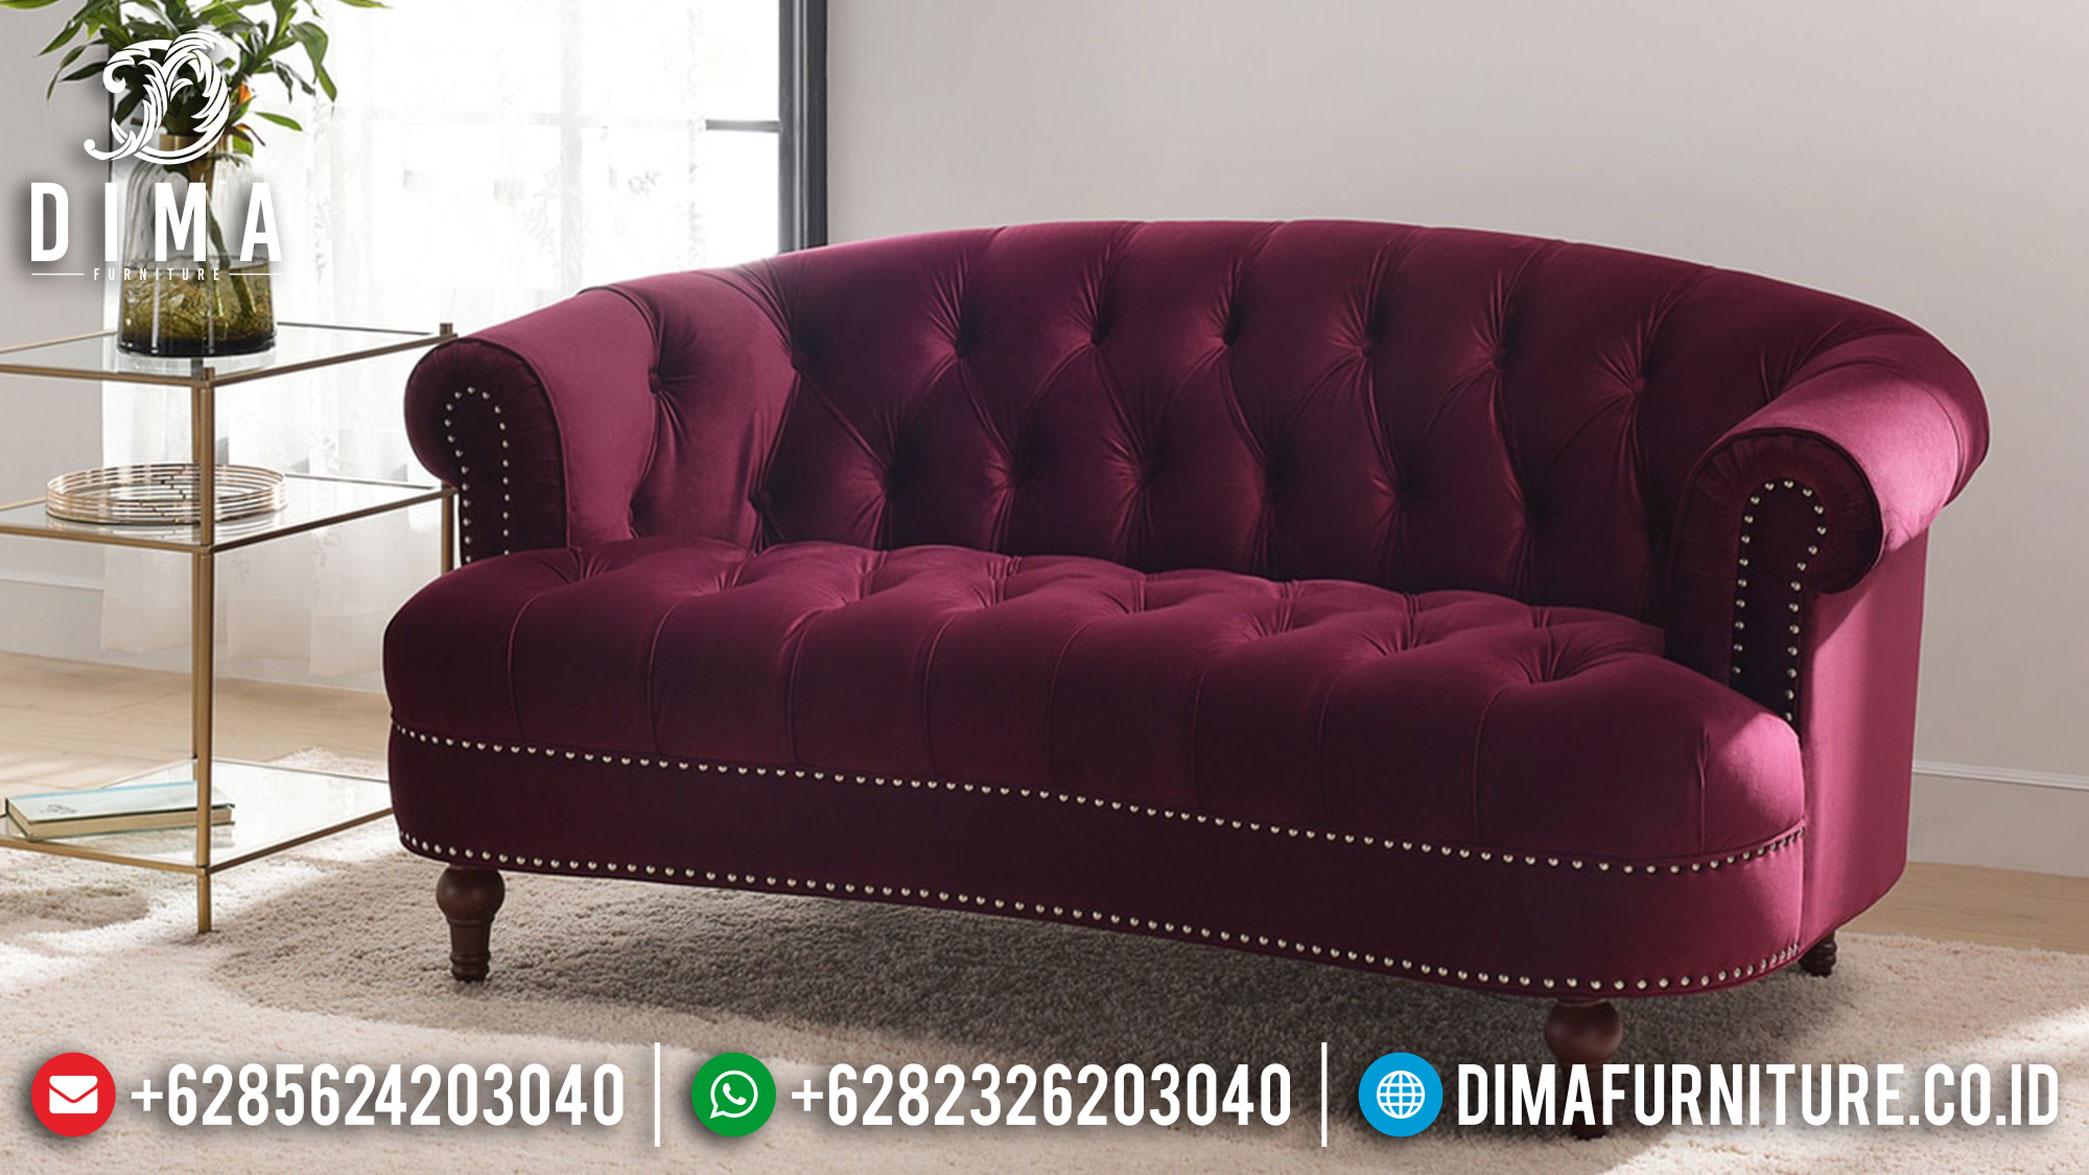 New Release Sofa Tamu 3 Seater Minimalis Modern Elegant Red Maroon MMJ-0936